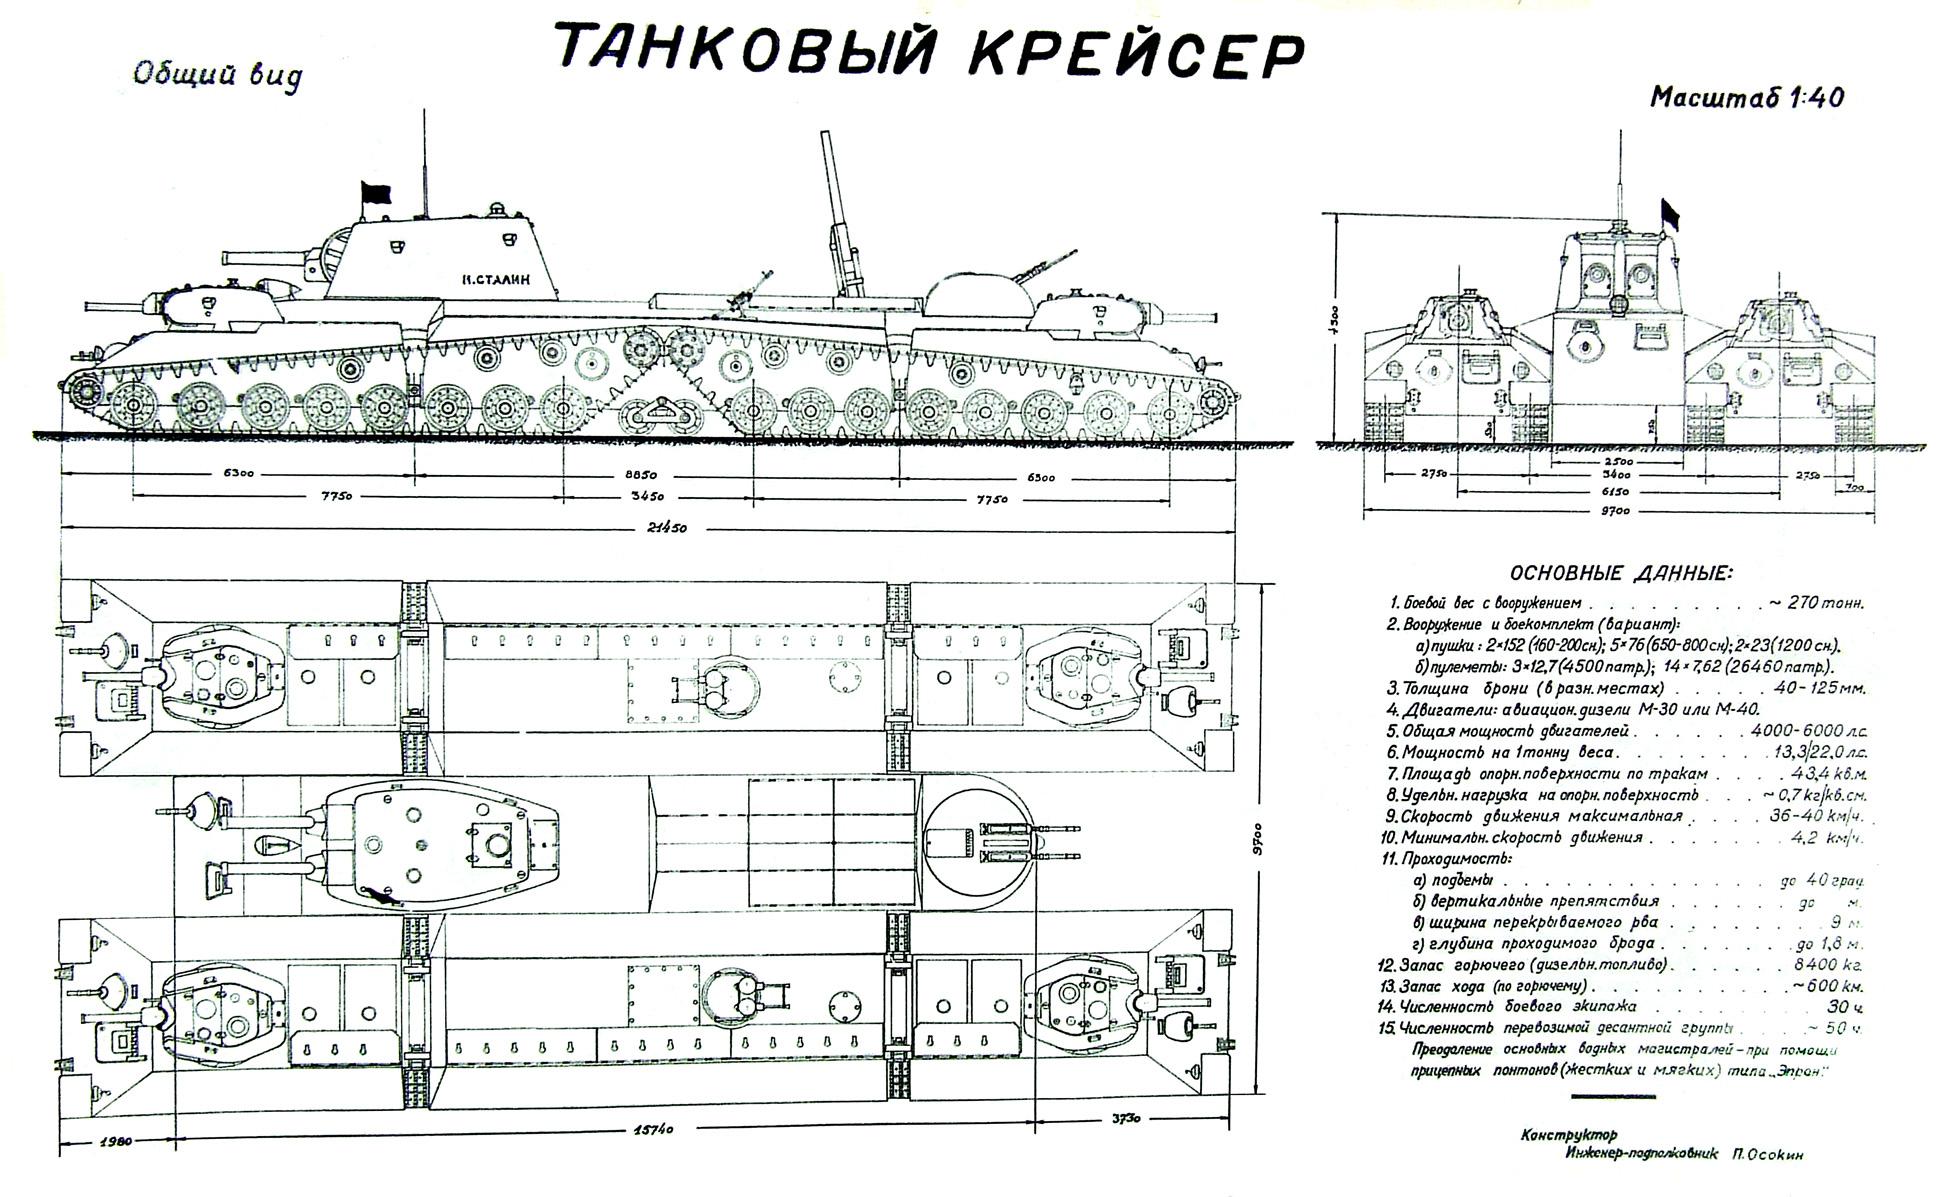 Ruski strategiski nuklearni potencijal - Page 3 139754_110821123_cruiser